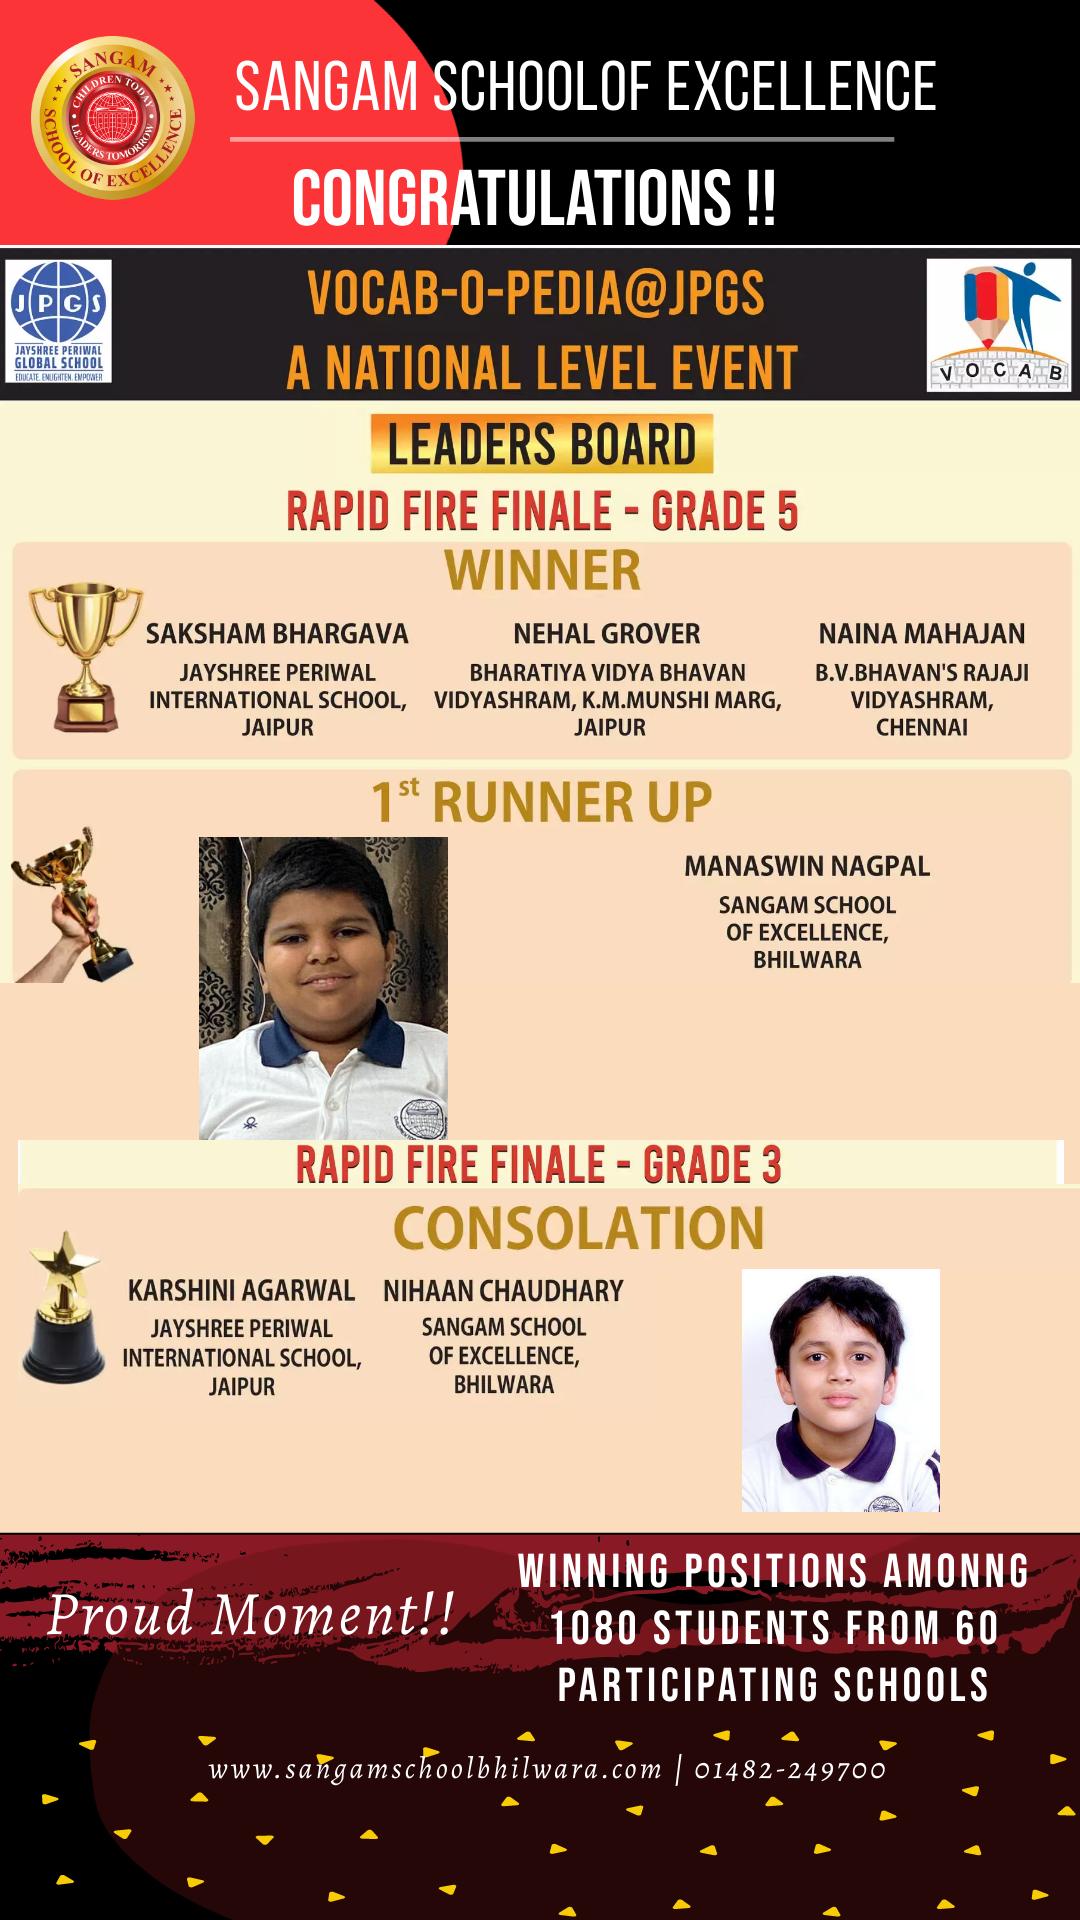 Vocab-O-Pedia Rapid Fire Finale Leaderboard!!!